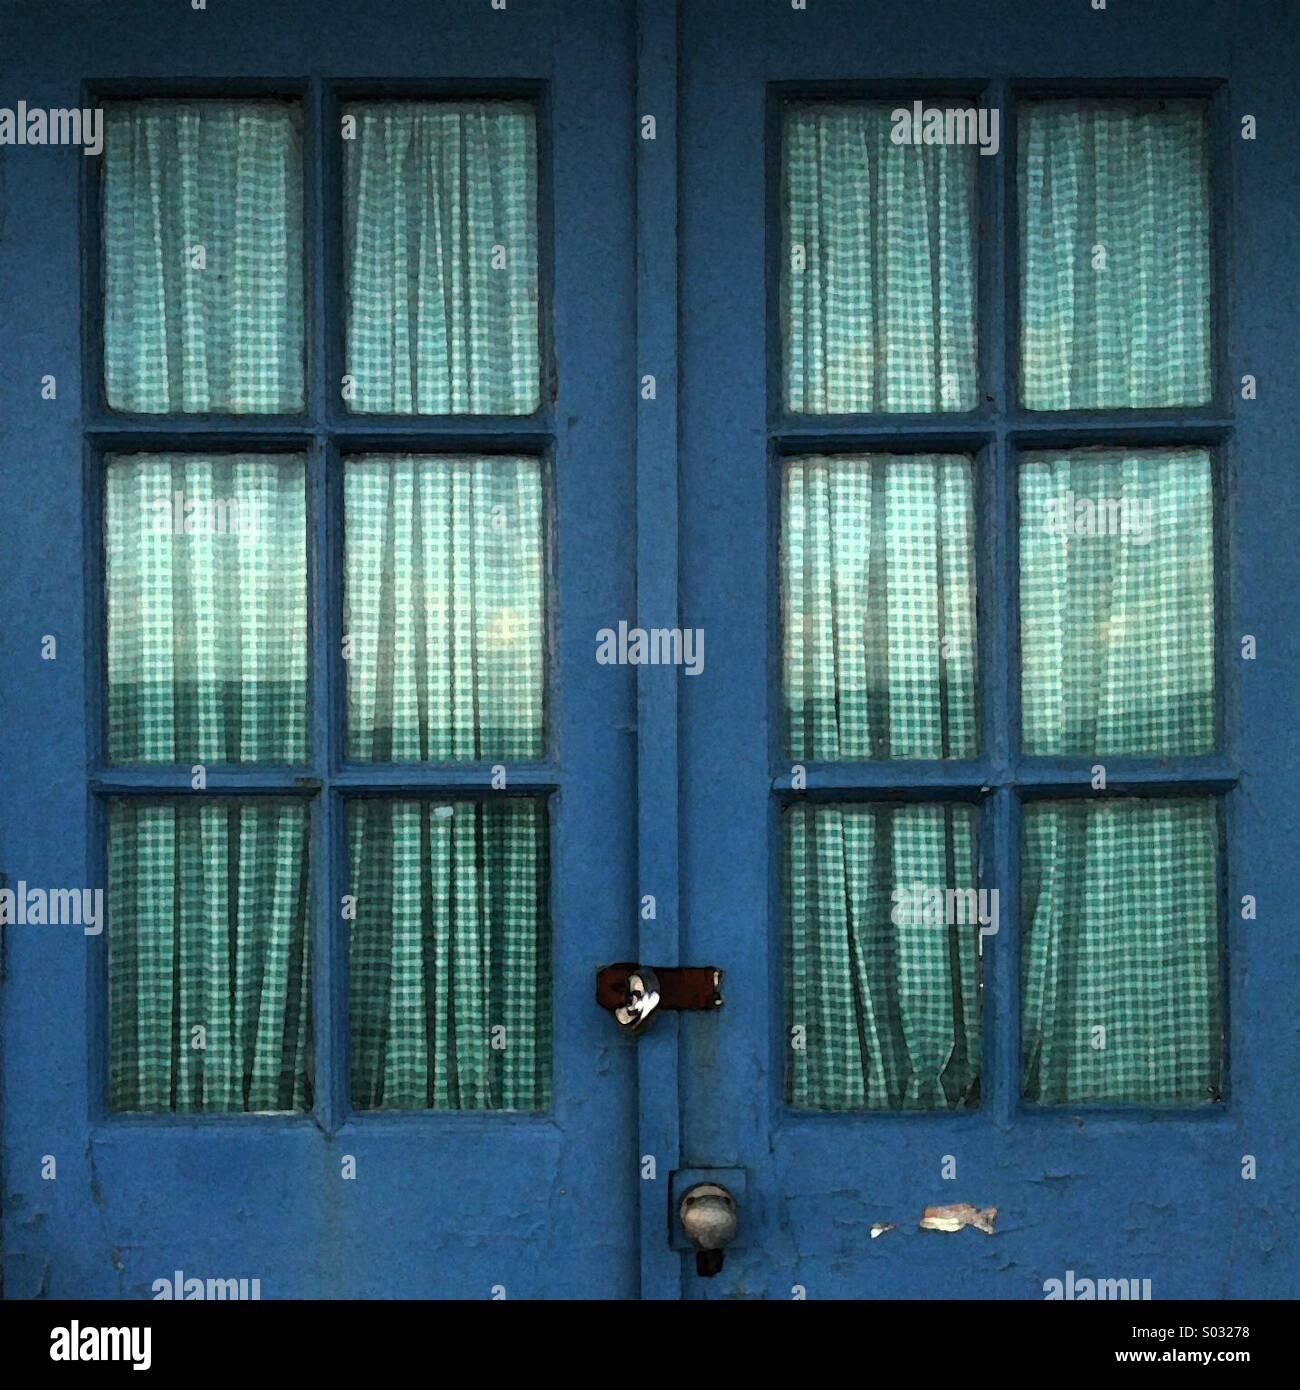 Gingham Curtains Stockfotos & Gingham Curtains Bilder - Alamy